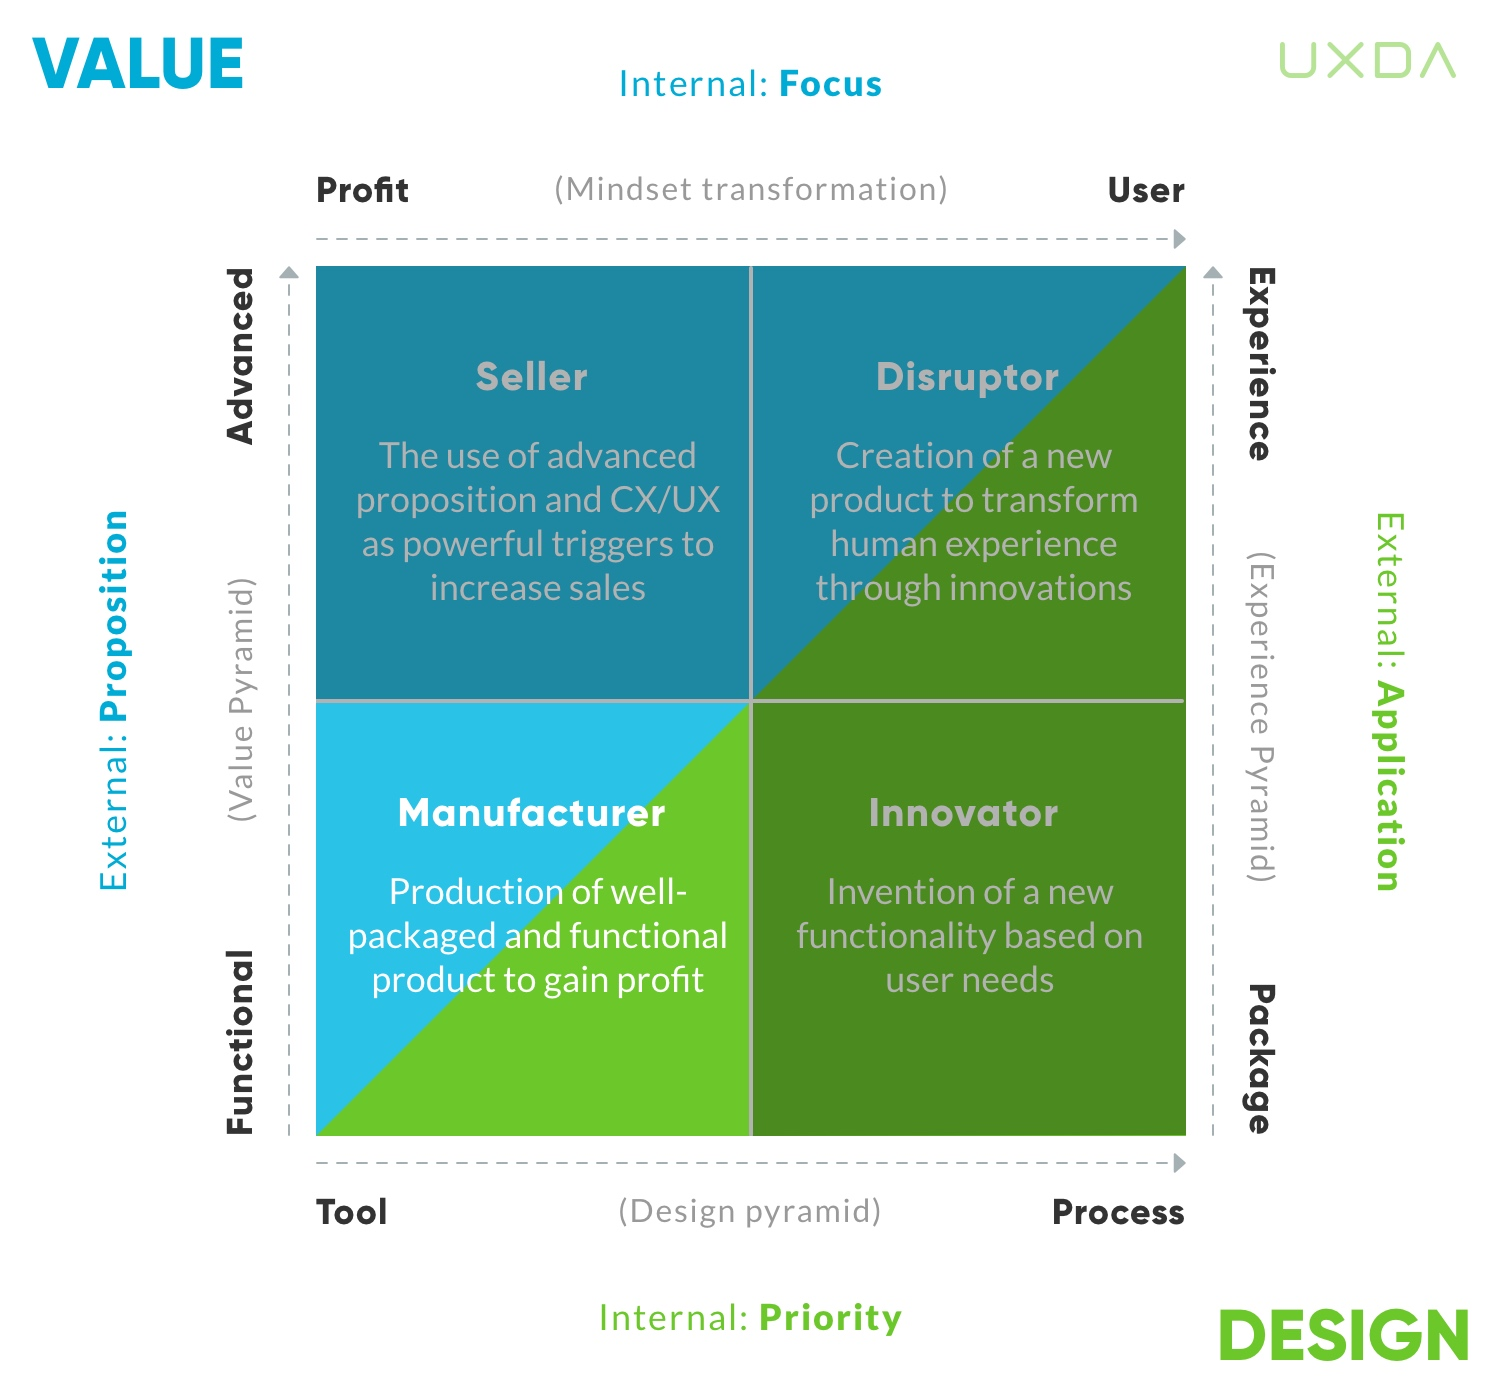 financial-design-matrix-for-banking-disruption-13.jpg